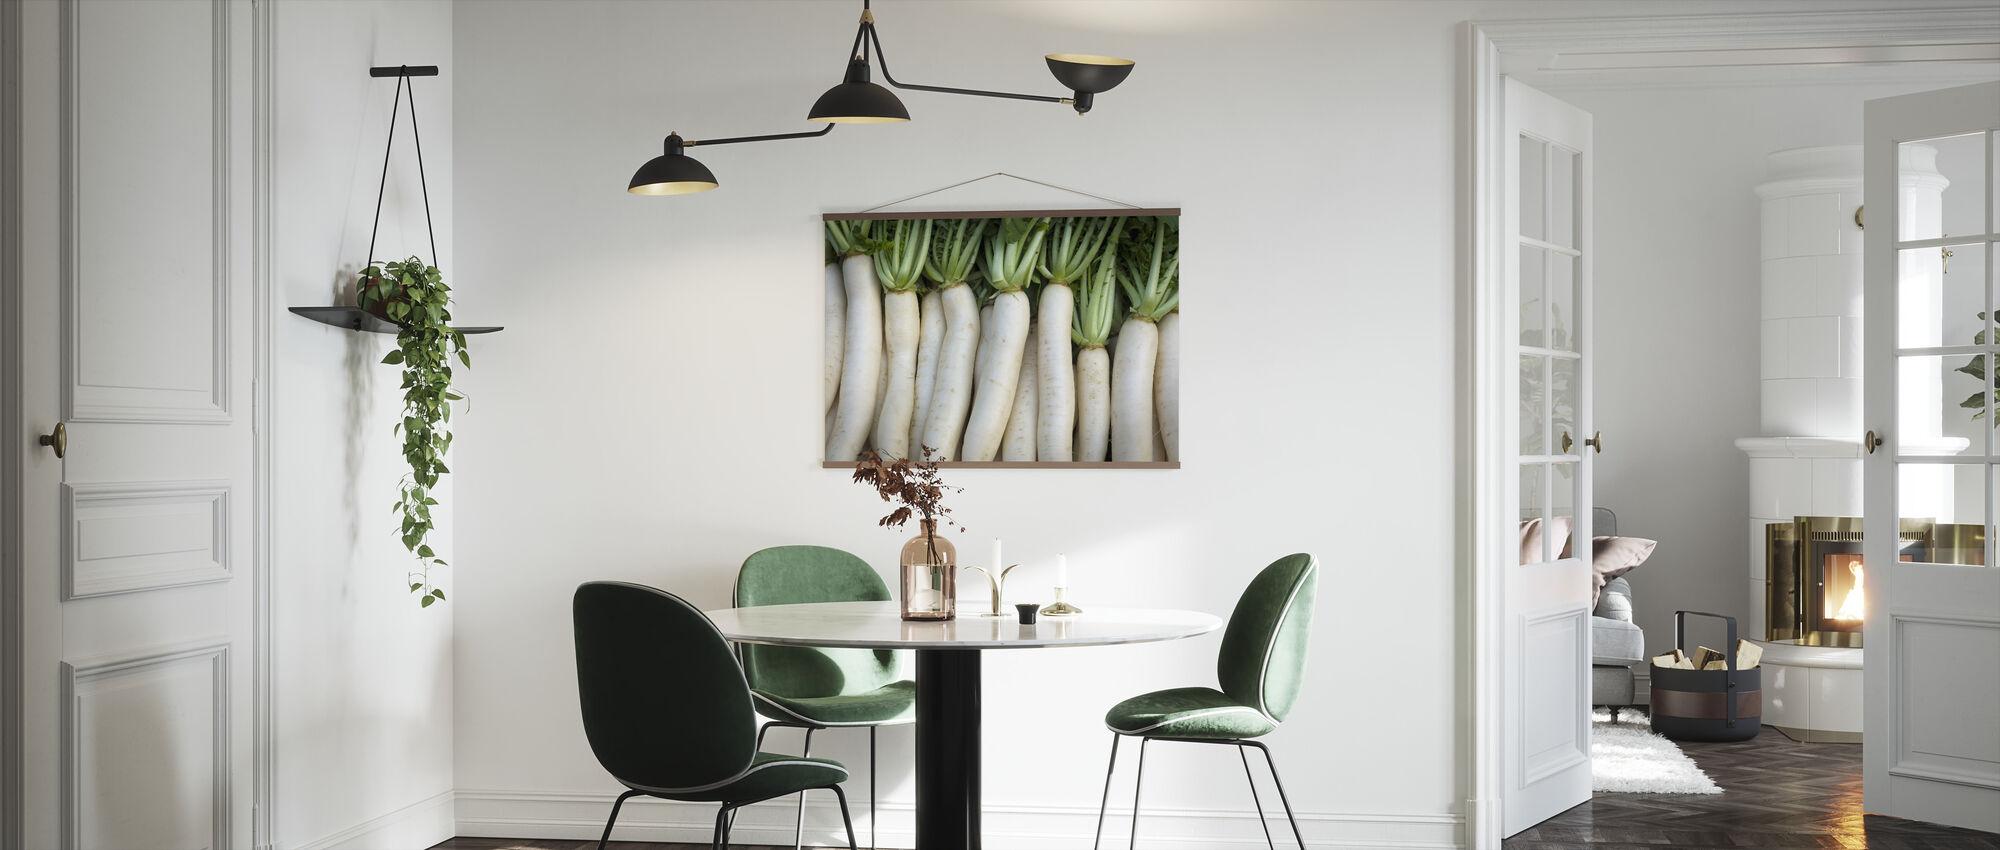 Turnips - Lluís Real - Poster - Kitchen